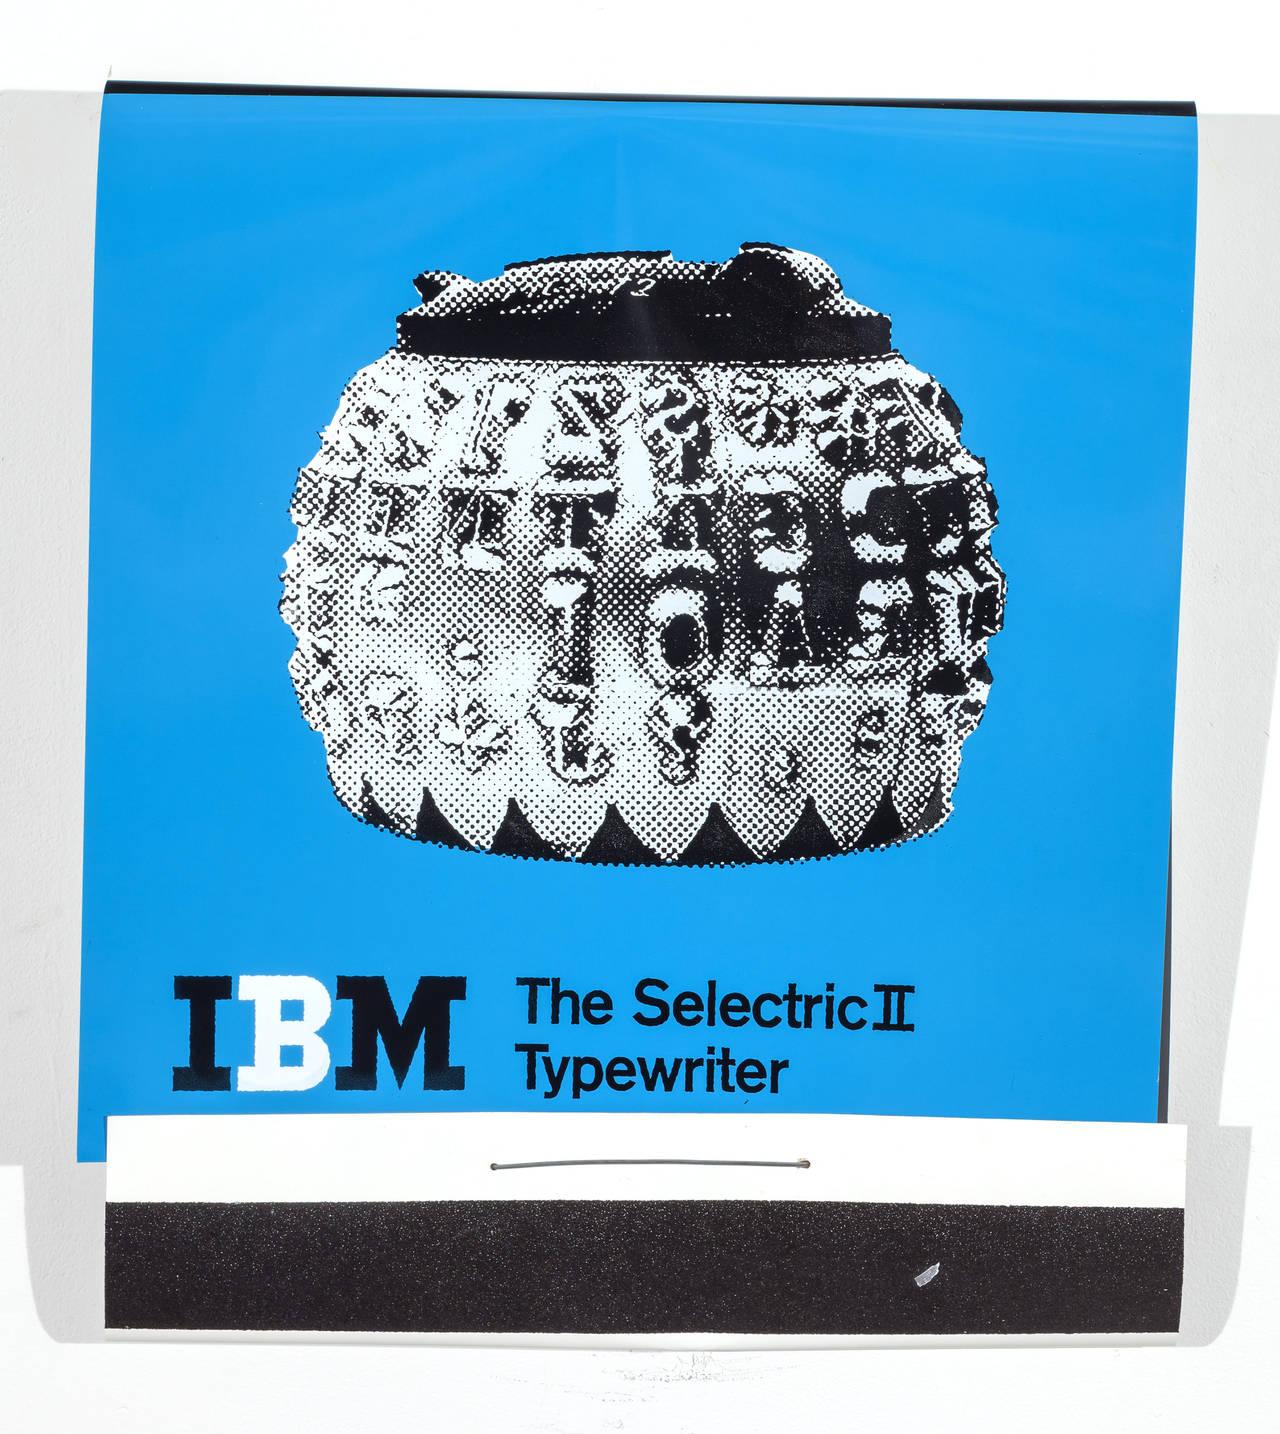 IBM - Sculpture by Skylar Fein